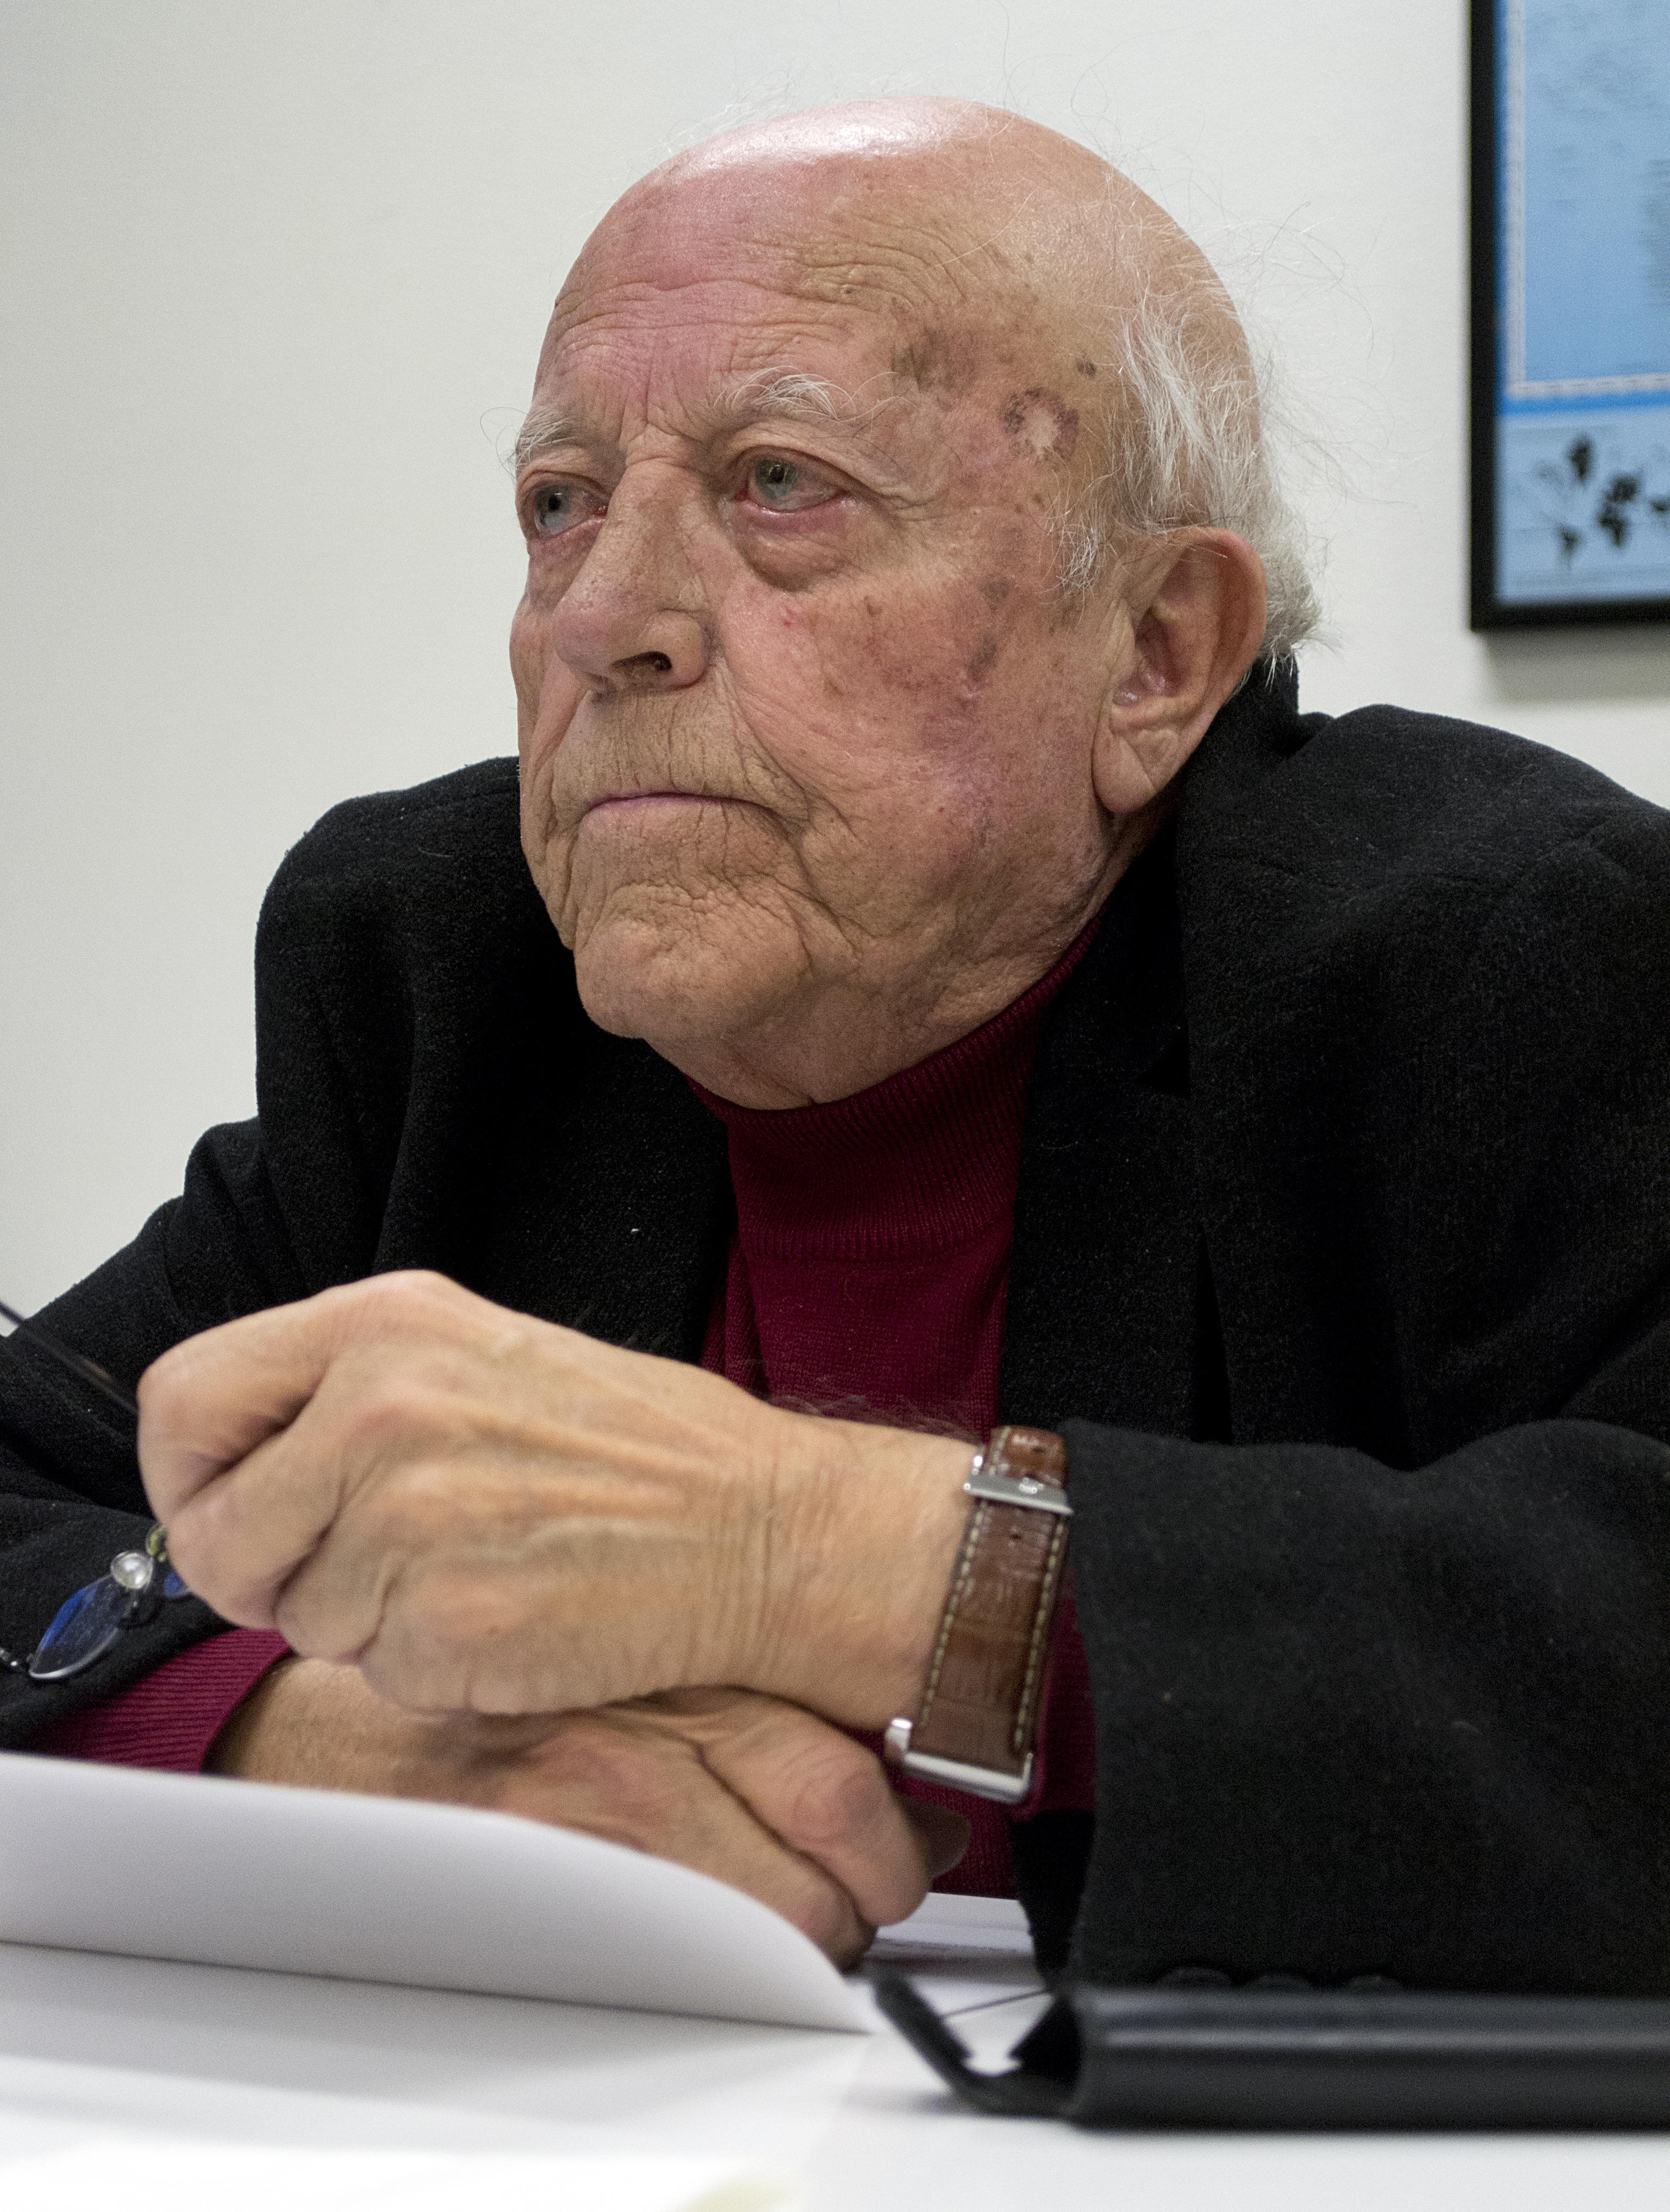 José Jiménez Lozano